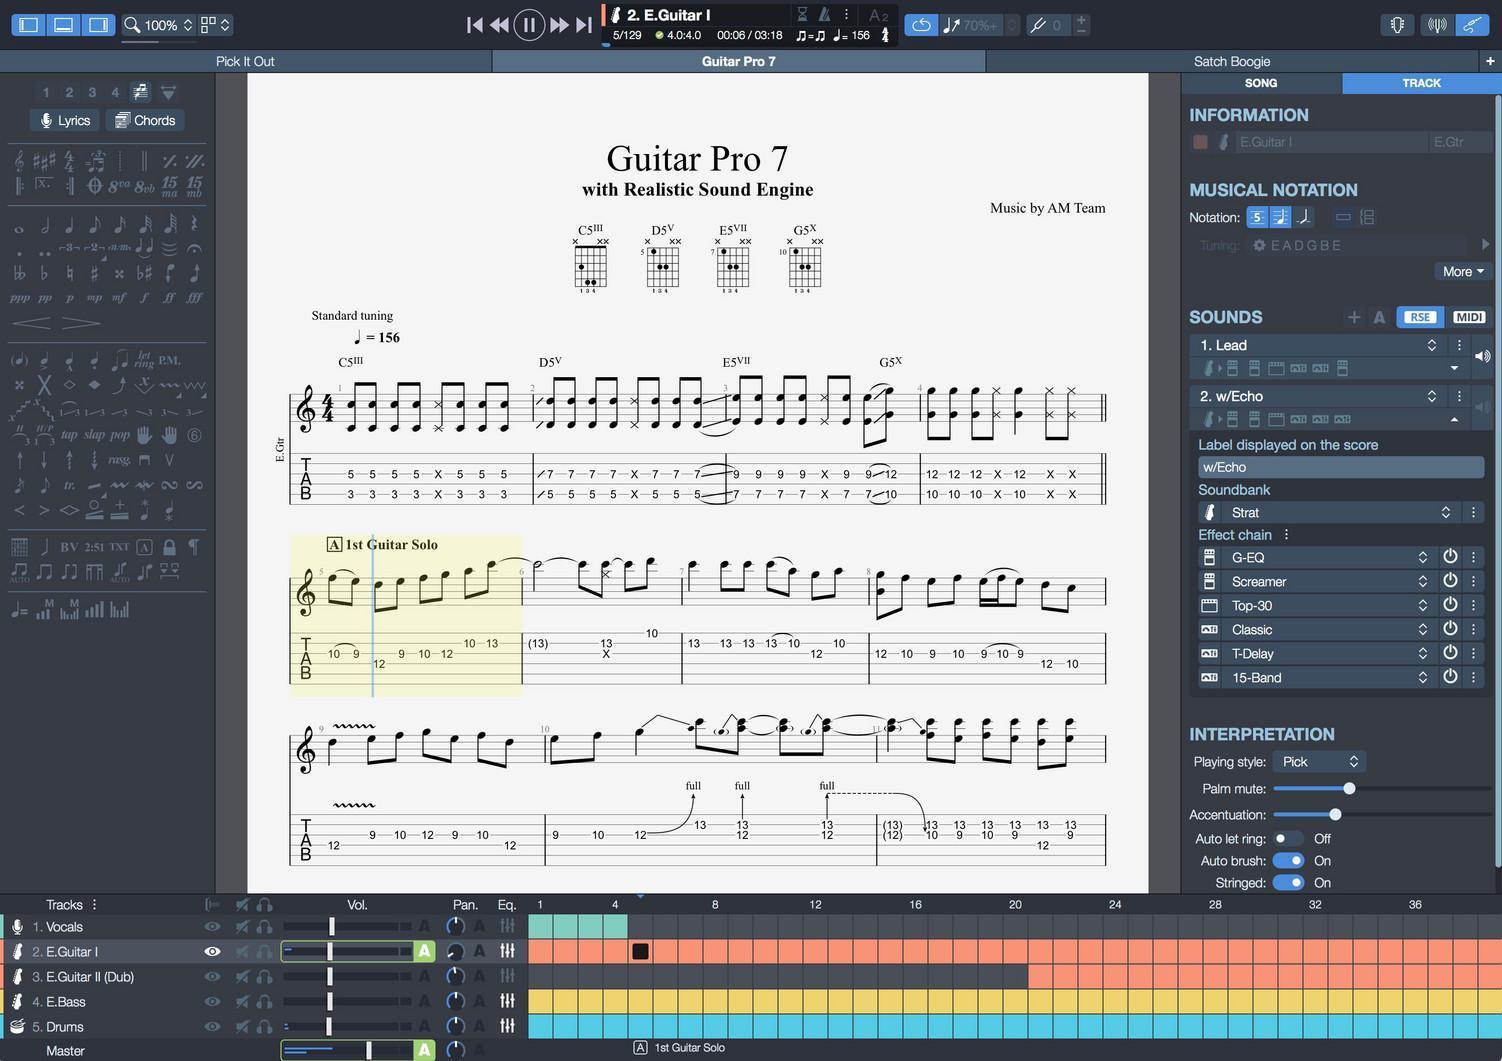 Guitar Pro - Sheet music editor software for guitar, bass ...